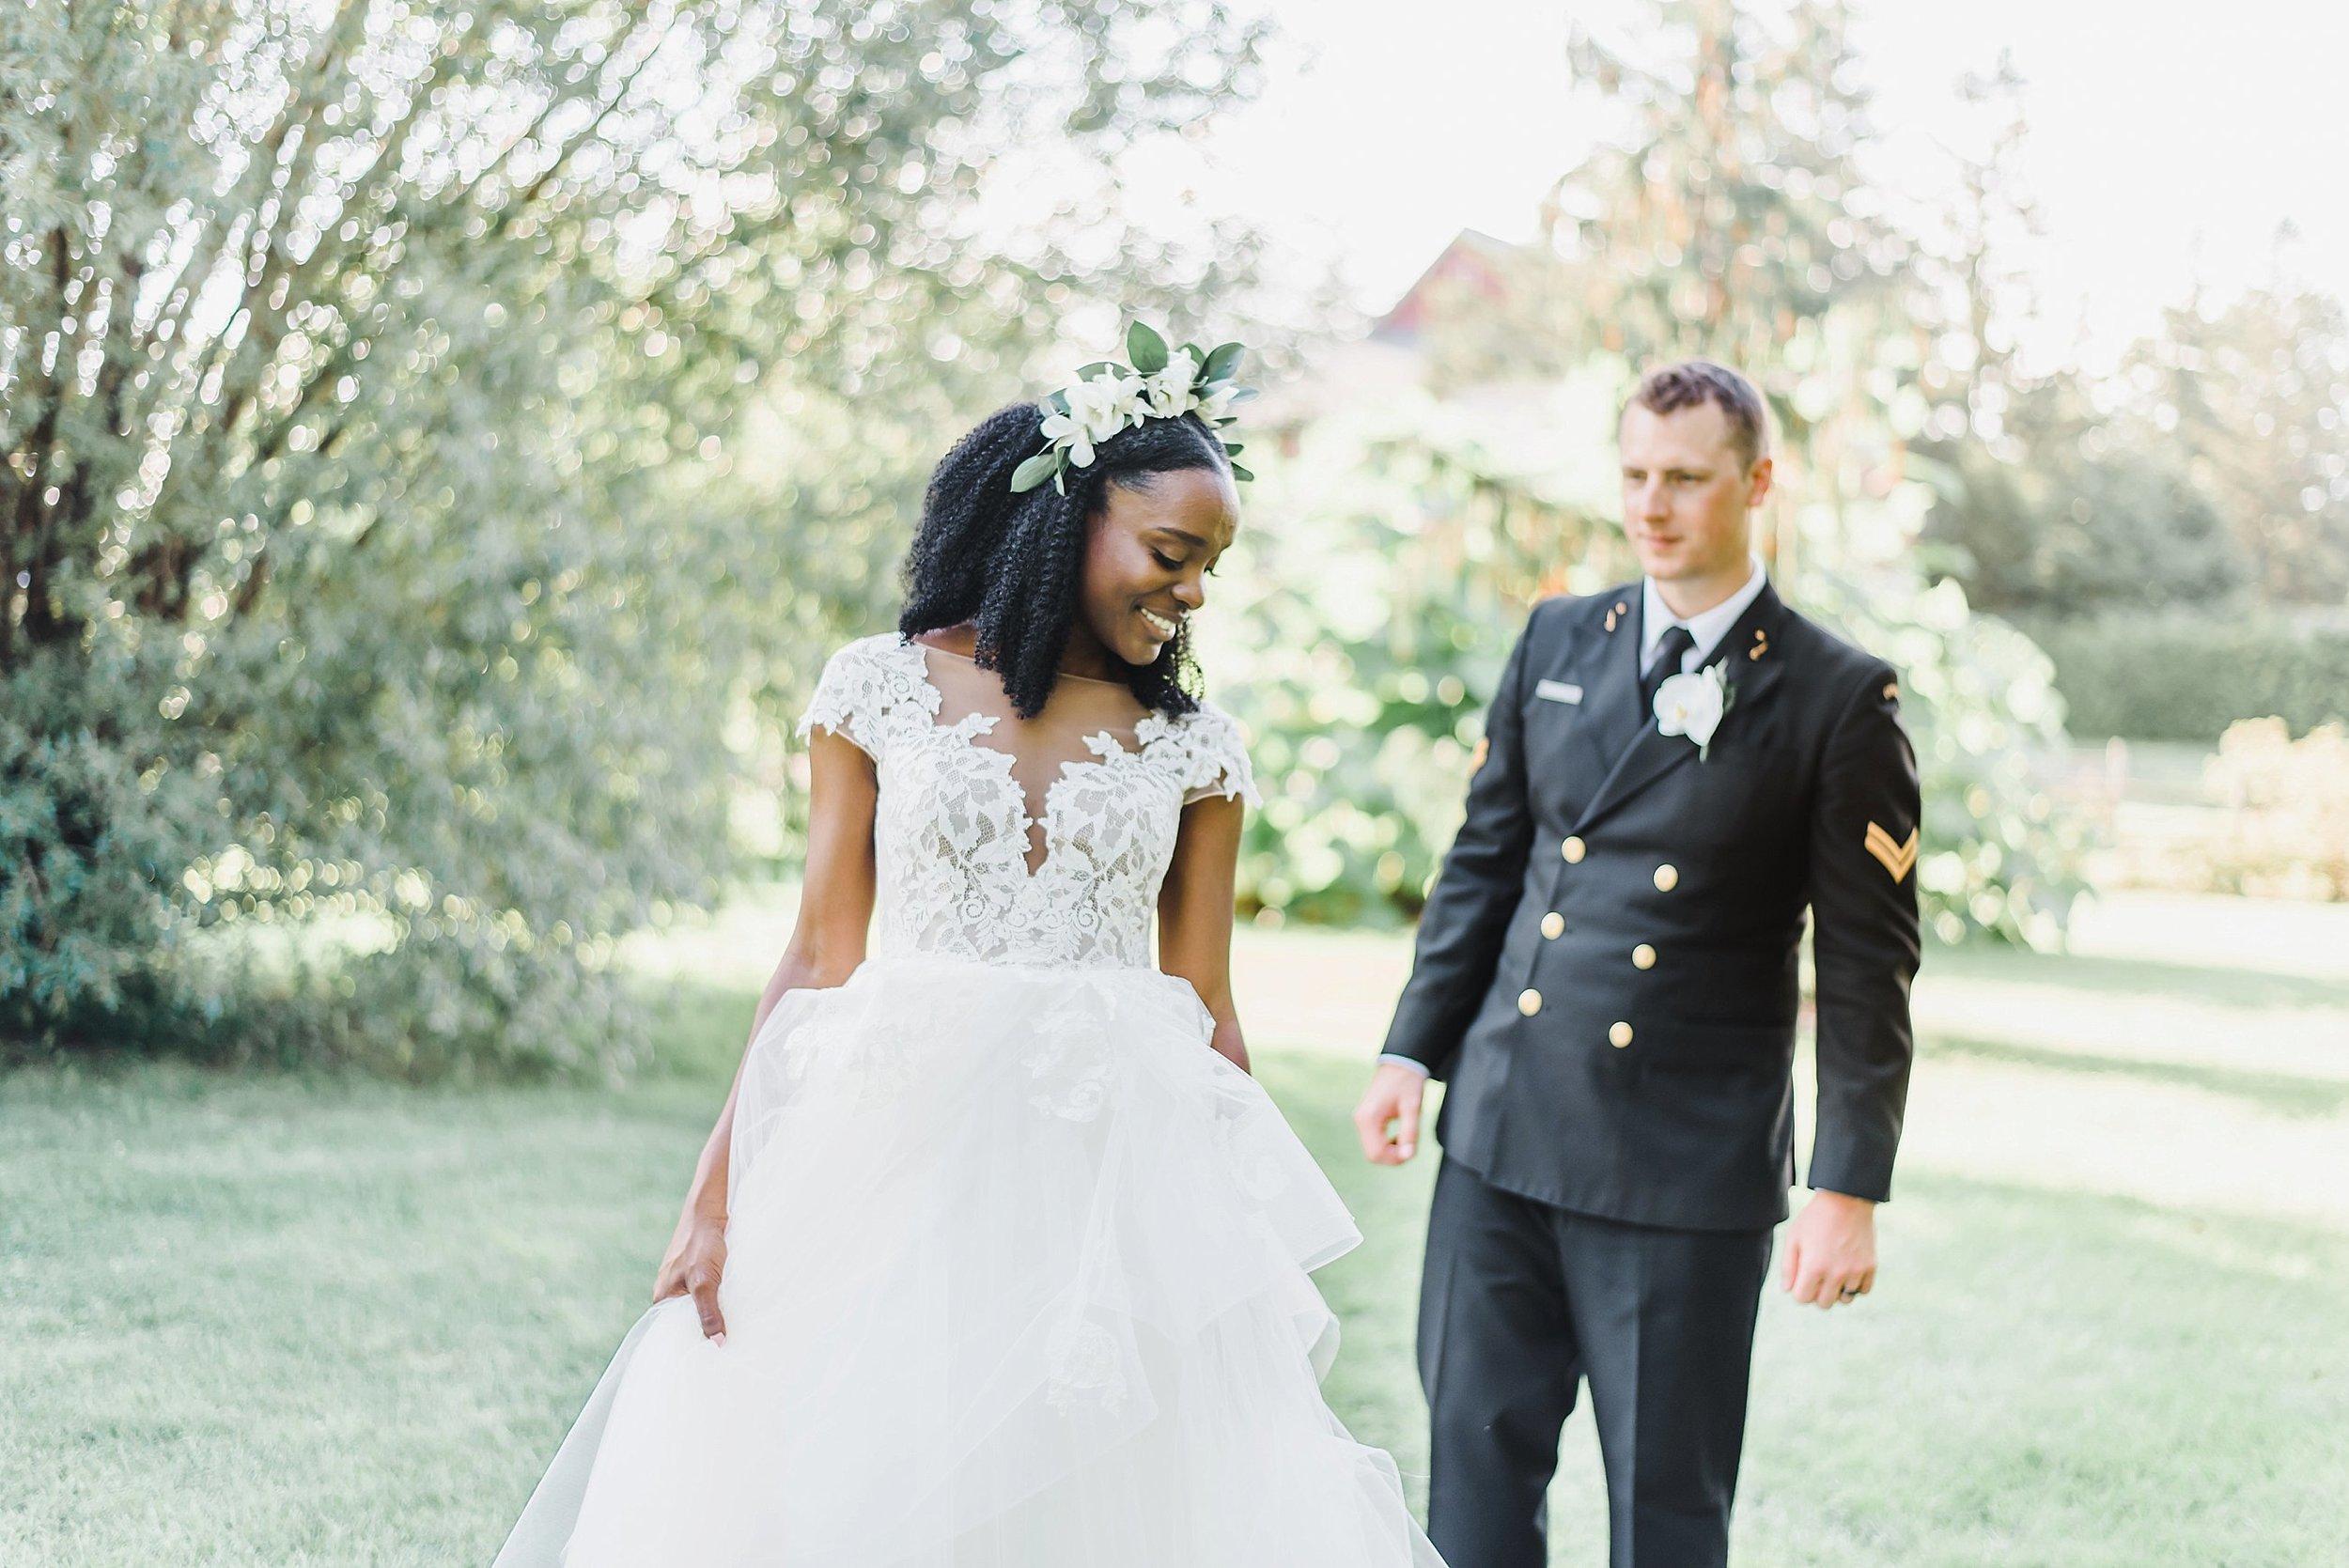 light airy indie fine art ottawa wedding photographer | Ali and Batoul Photography_1003.jpg